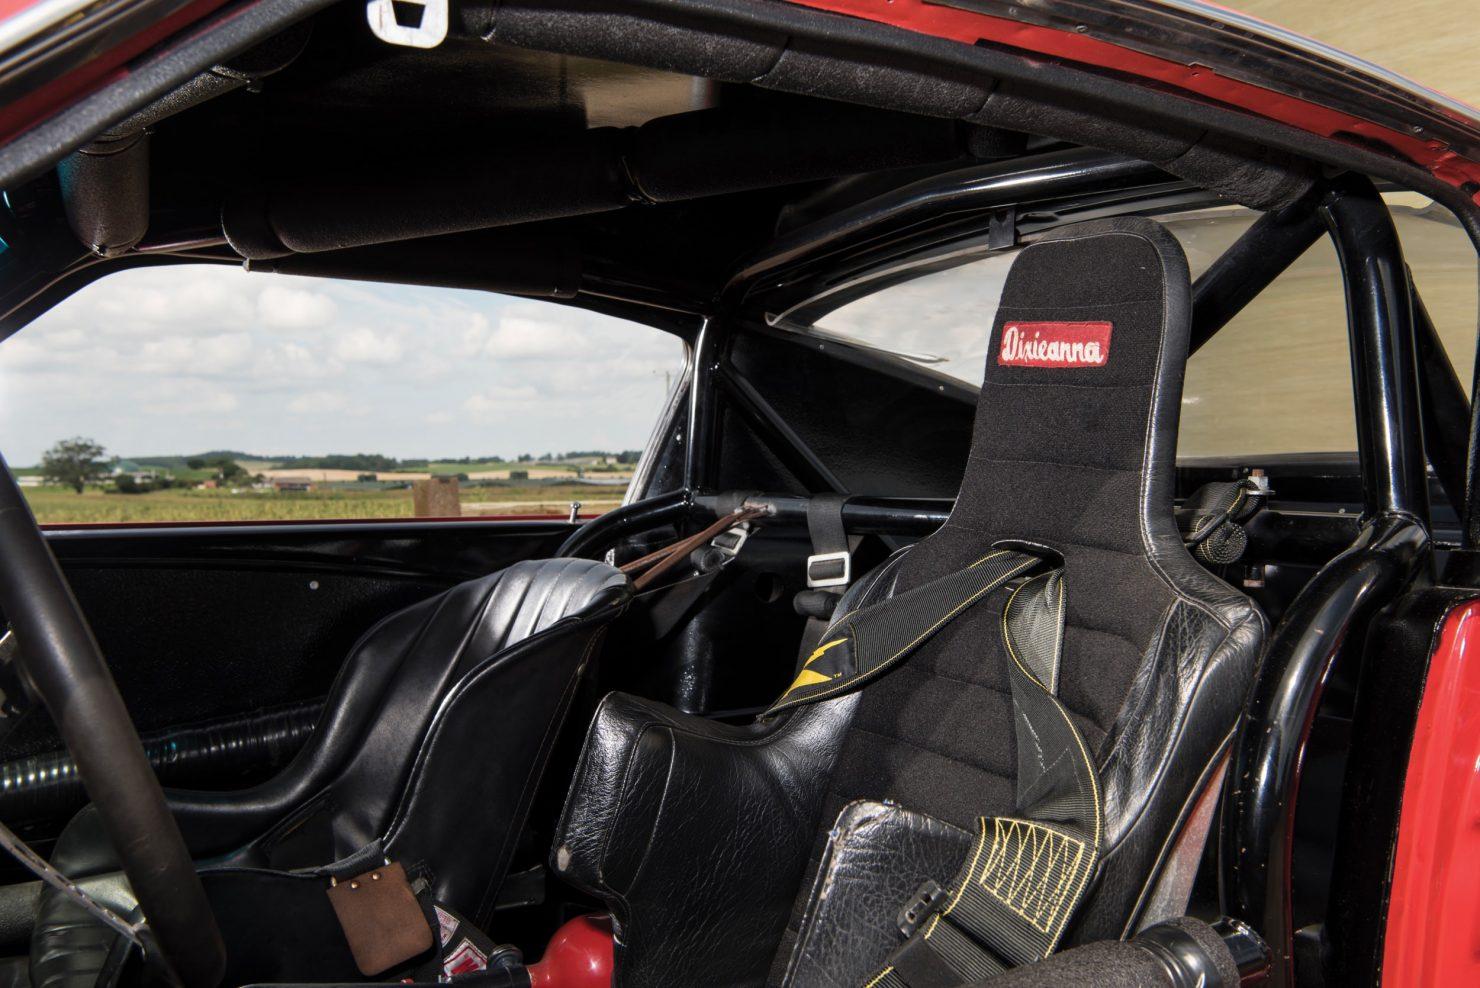 shelby gt350 race car 12 1480x988 - 1966 Shelby GT350 - Period SCCA Race Car